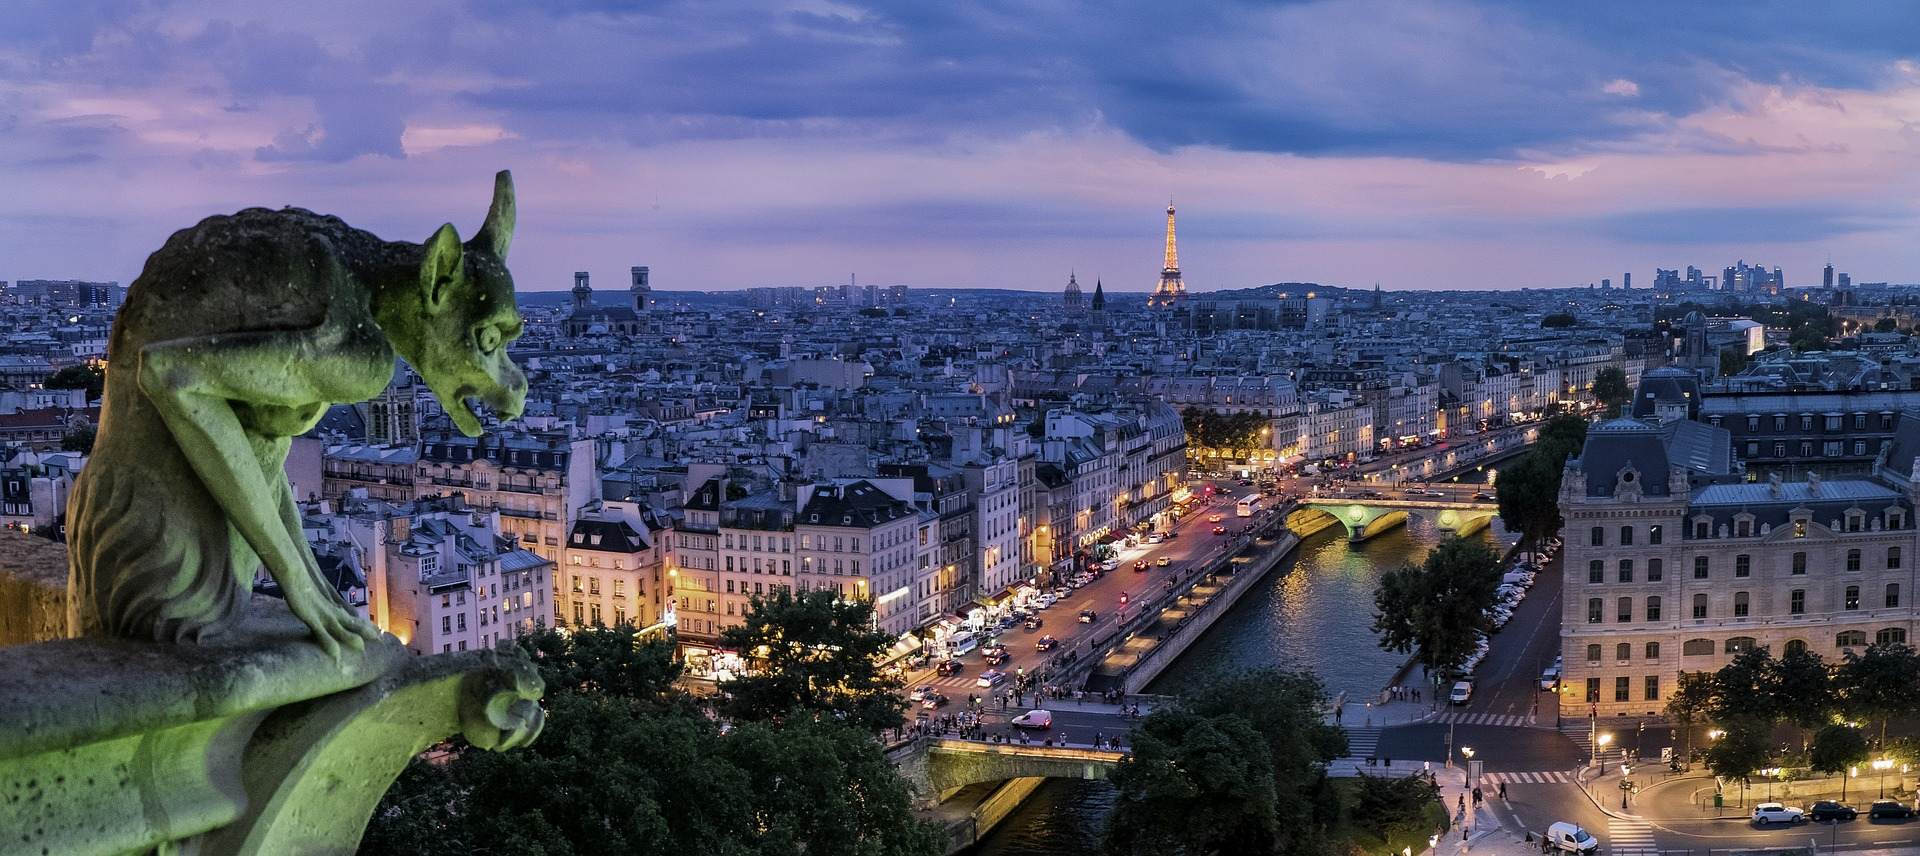 Gargoyles sui tetti di Parigi